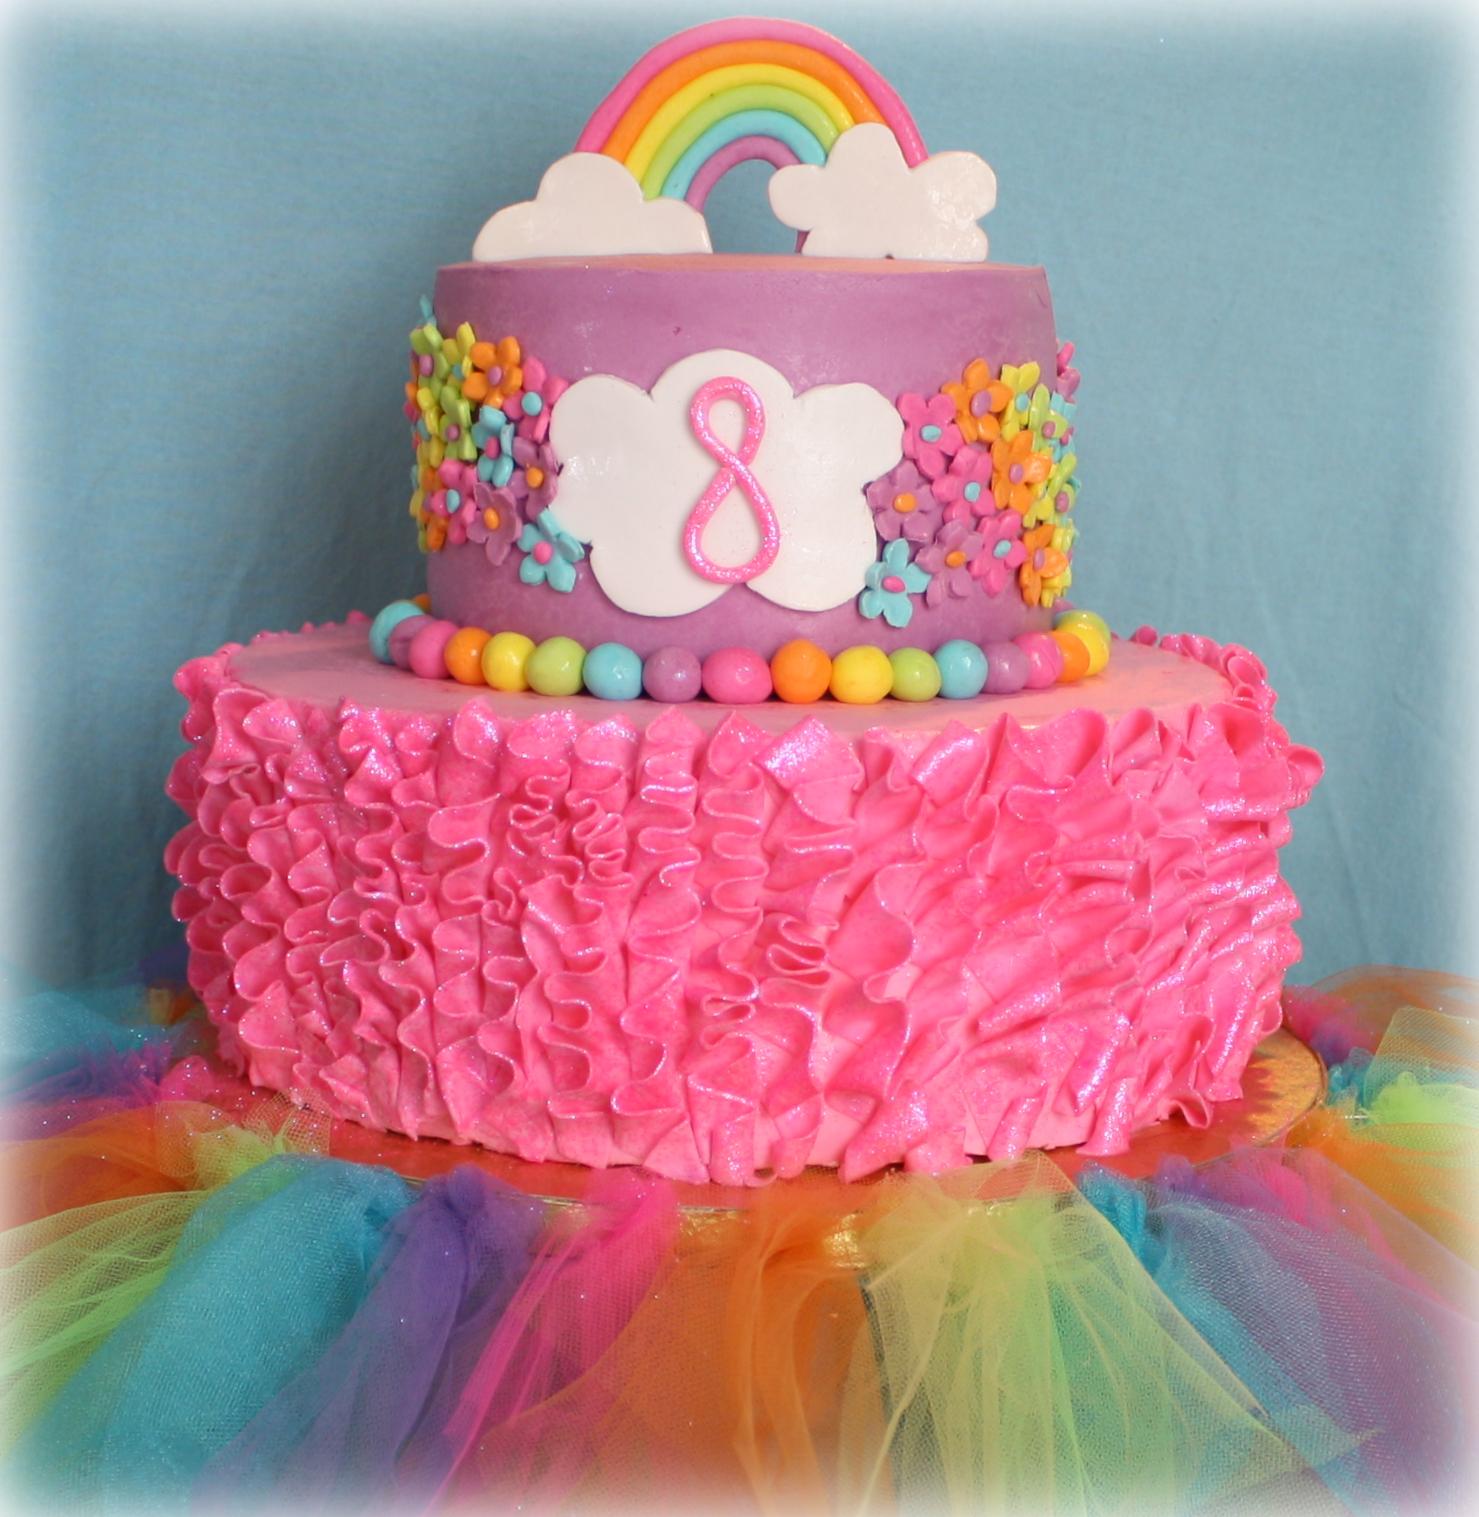 Birthday Cakes For Girls 8th Birthday www.pixshark.com ...